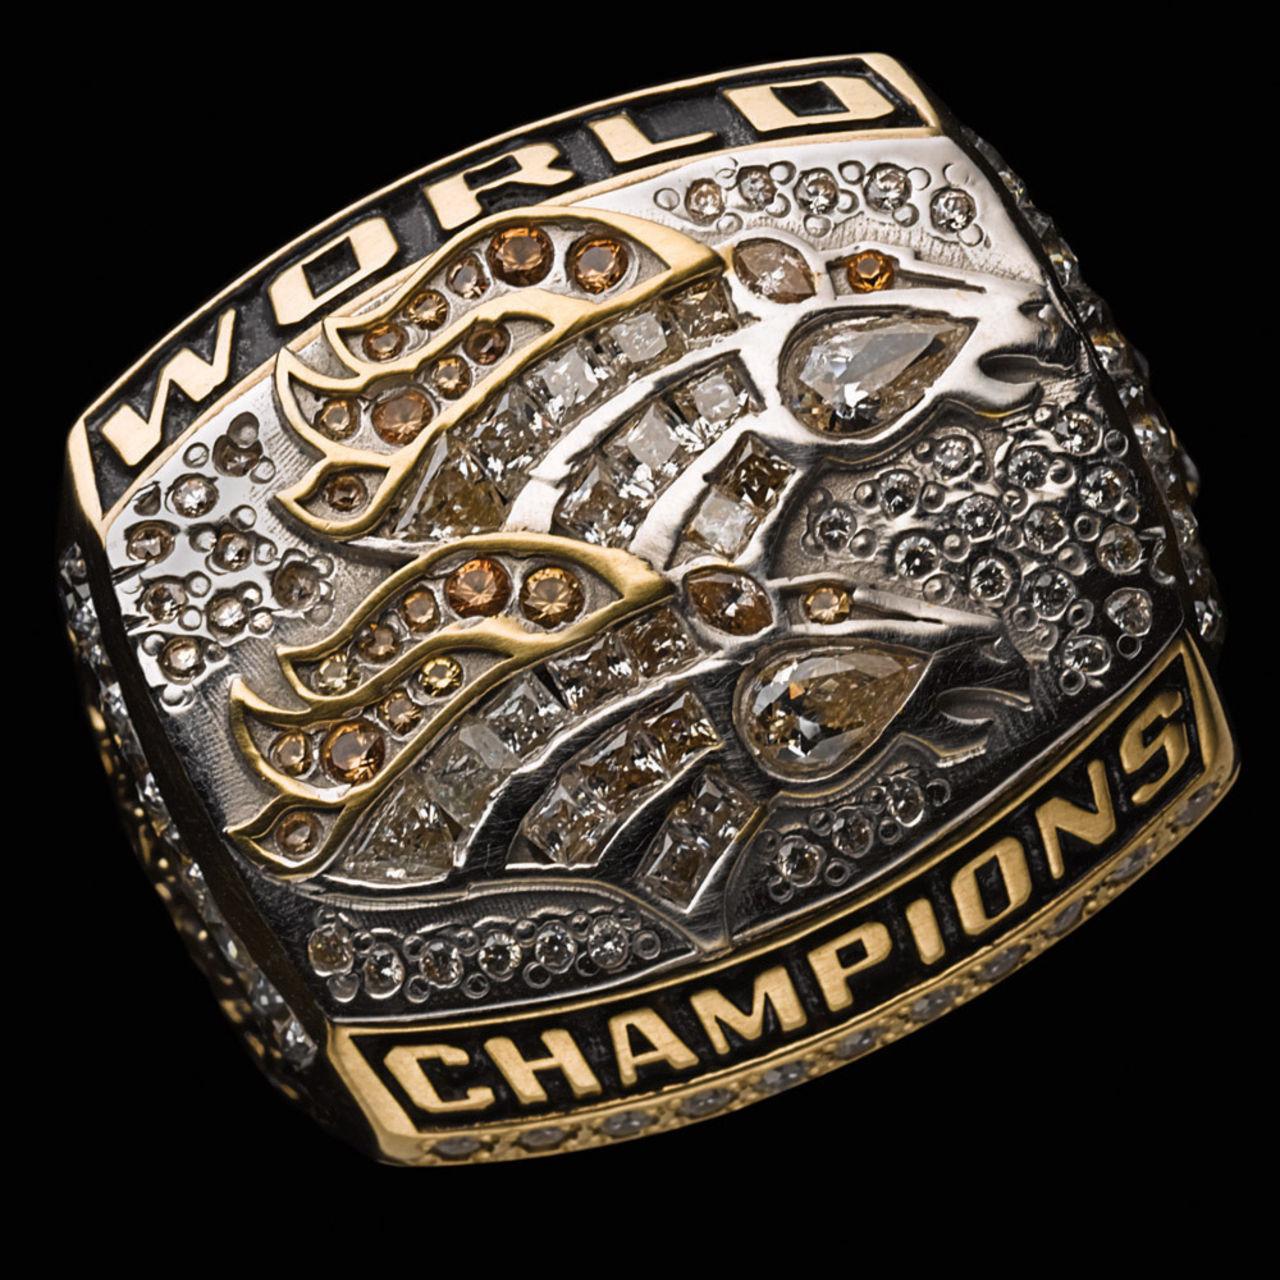 Denver Broncos 1999 champions ring